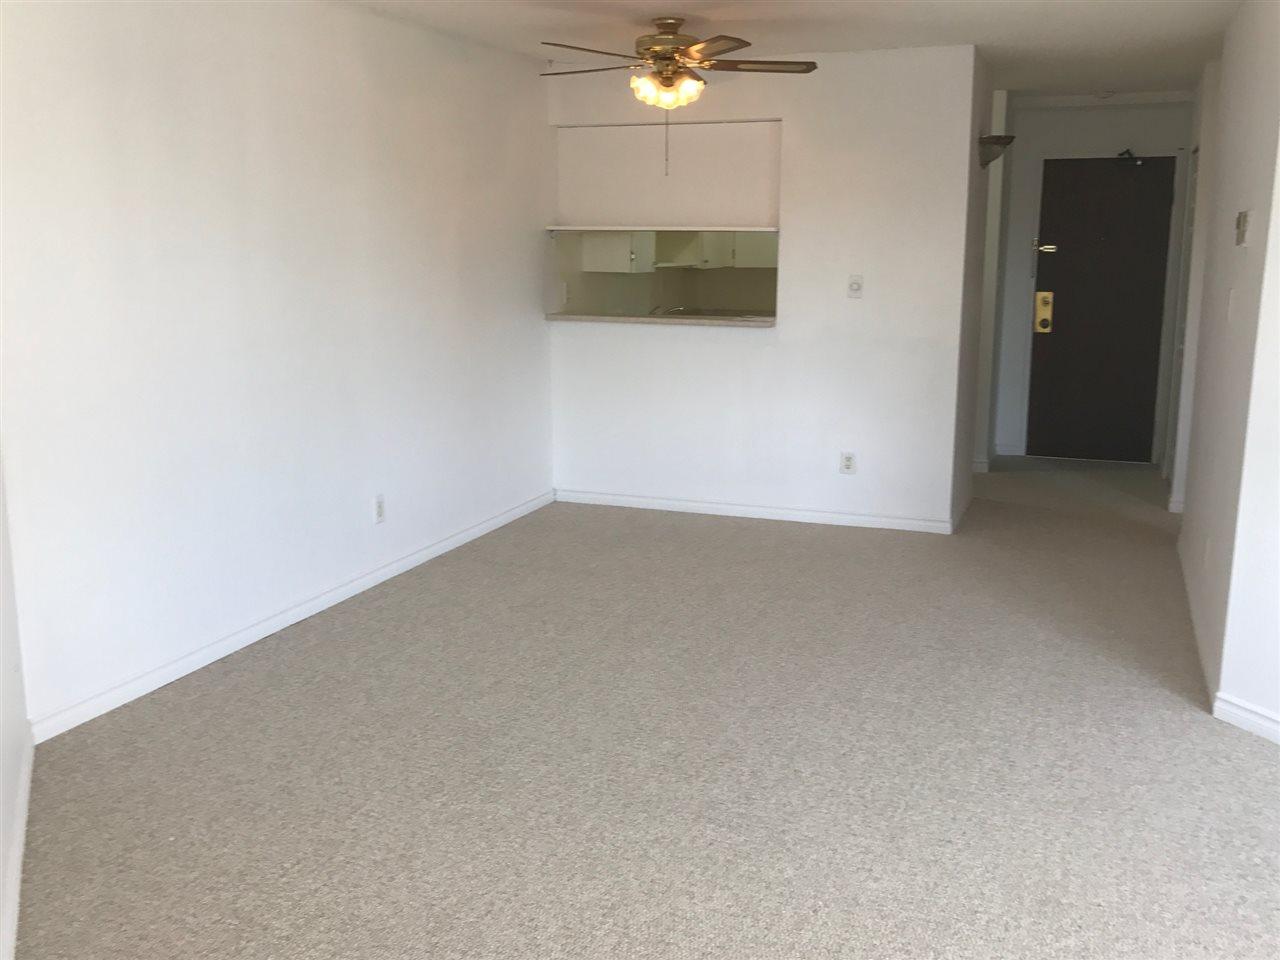 Condo Apartment at 305 5294 204 STREET, Unit 305, Langley, British Columbia. Image 3